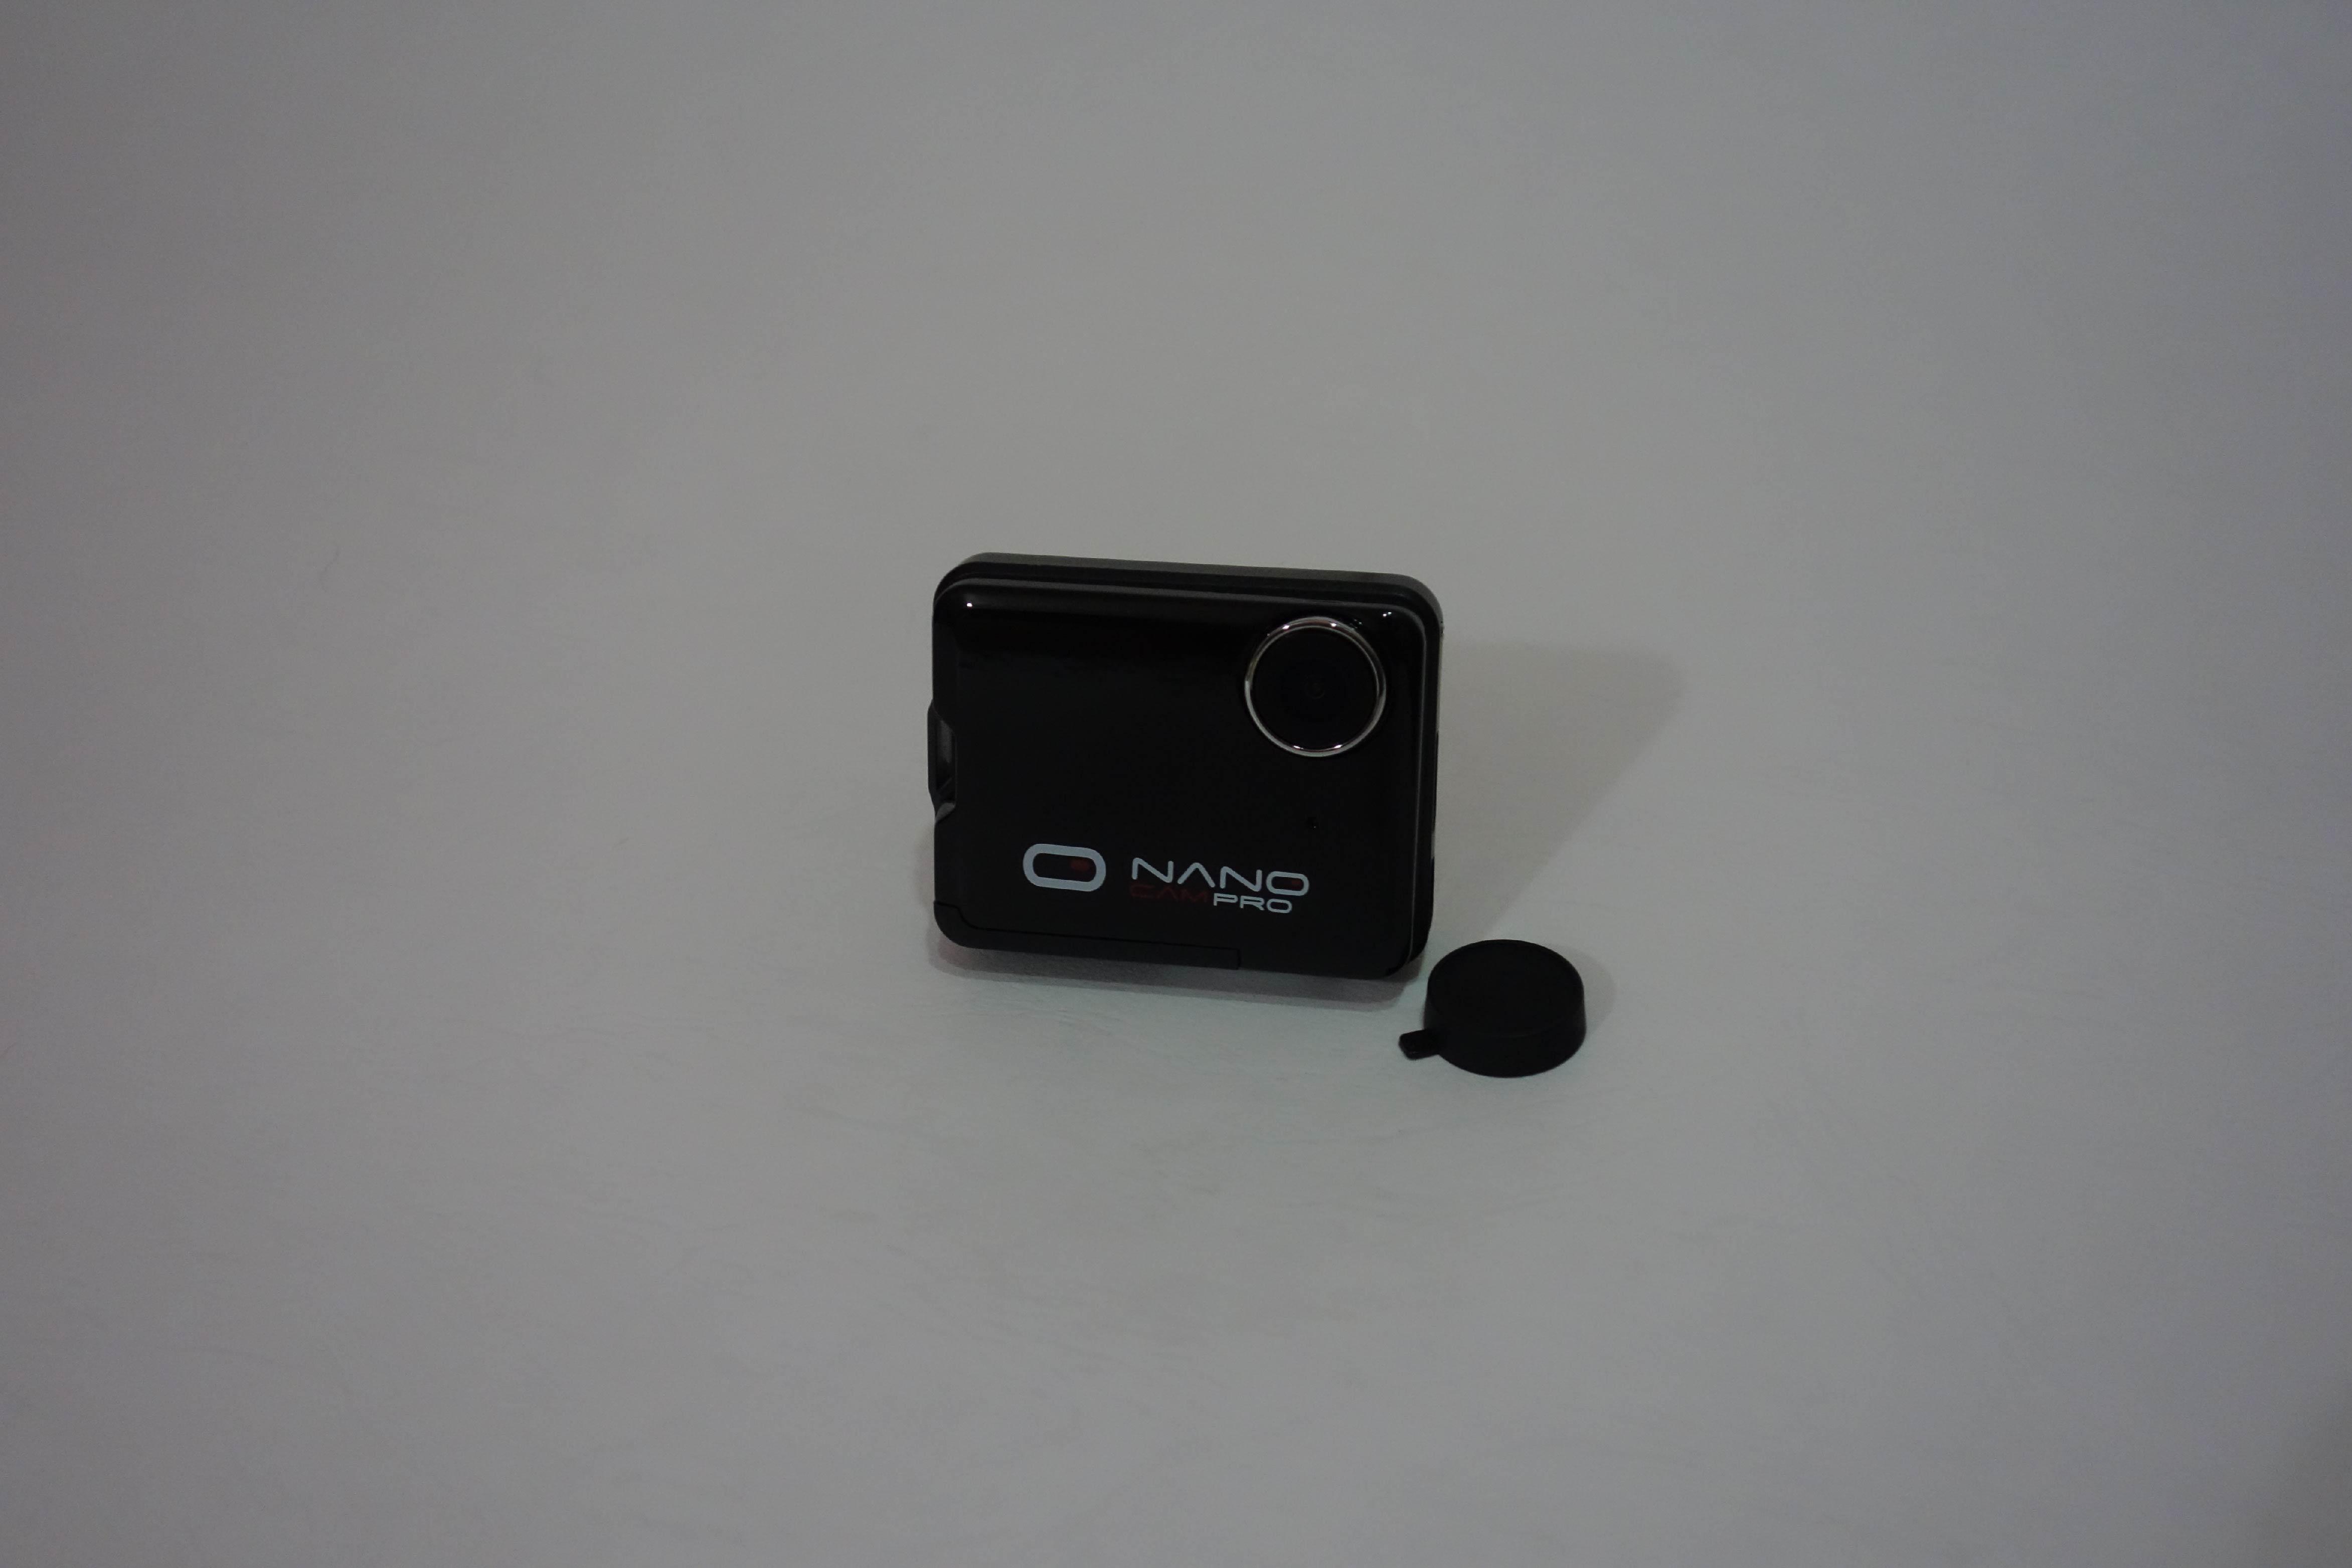 ELK-美商NANO CAMPRO T3頂級版行車紀錄器 1080P FULL HD超強夜拍王 採用聯詠96650夜視處理晶片(保固詳情請參閱商品描述) 5